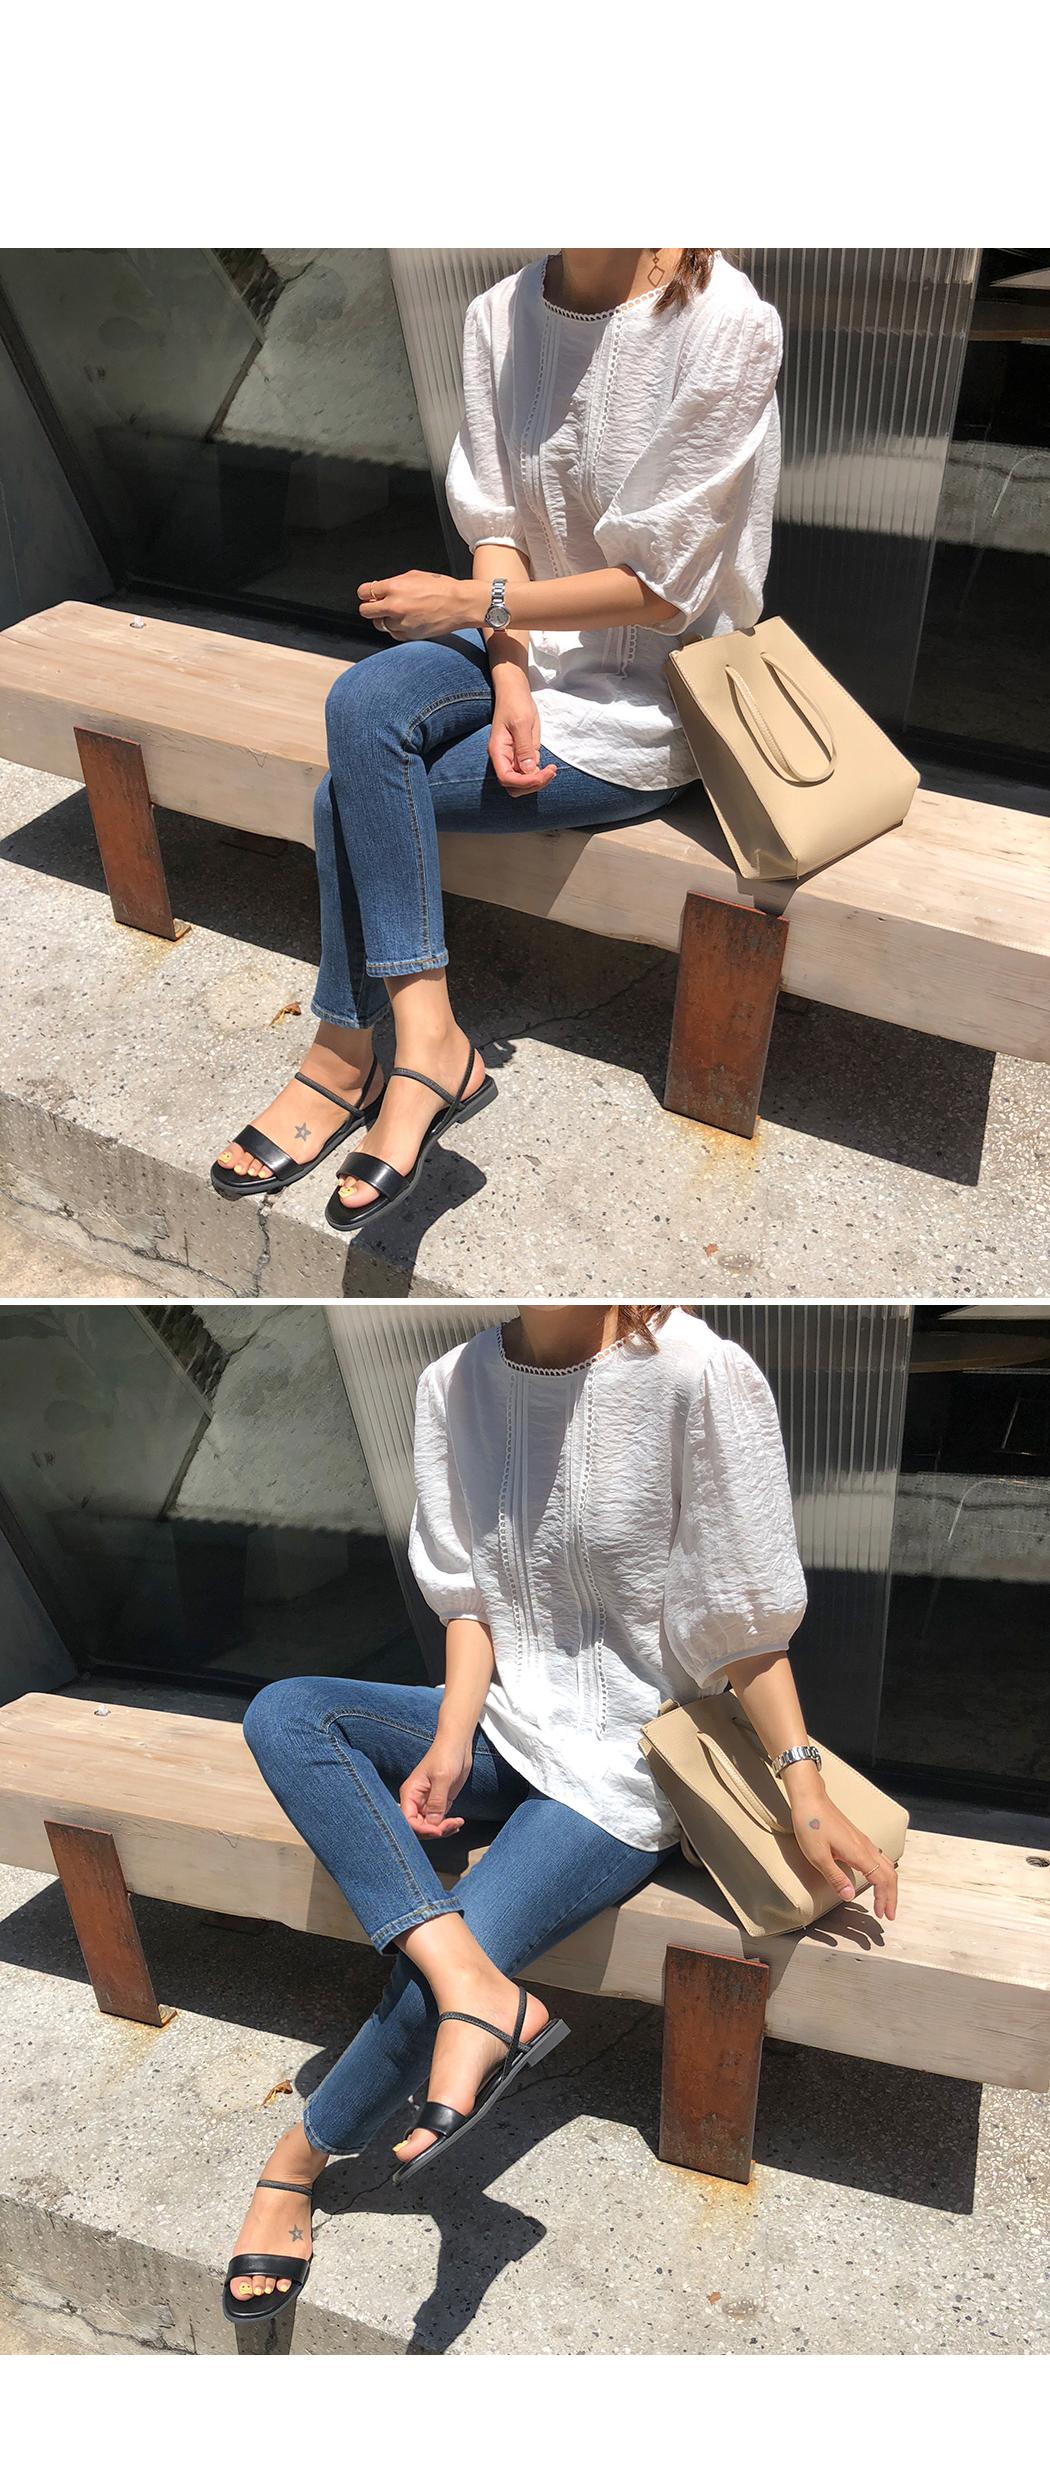 Ciel-strap sandals